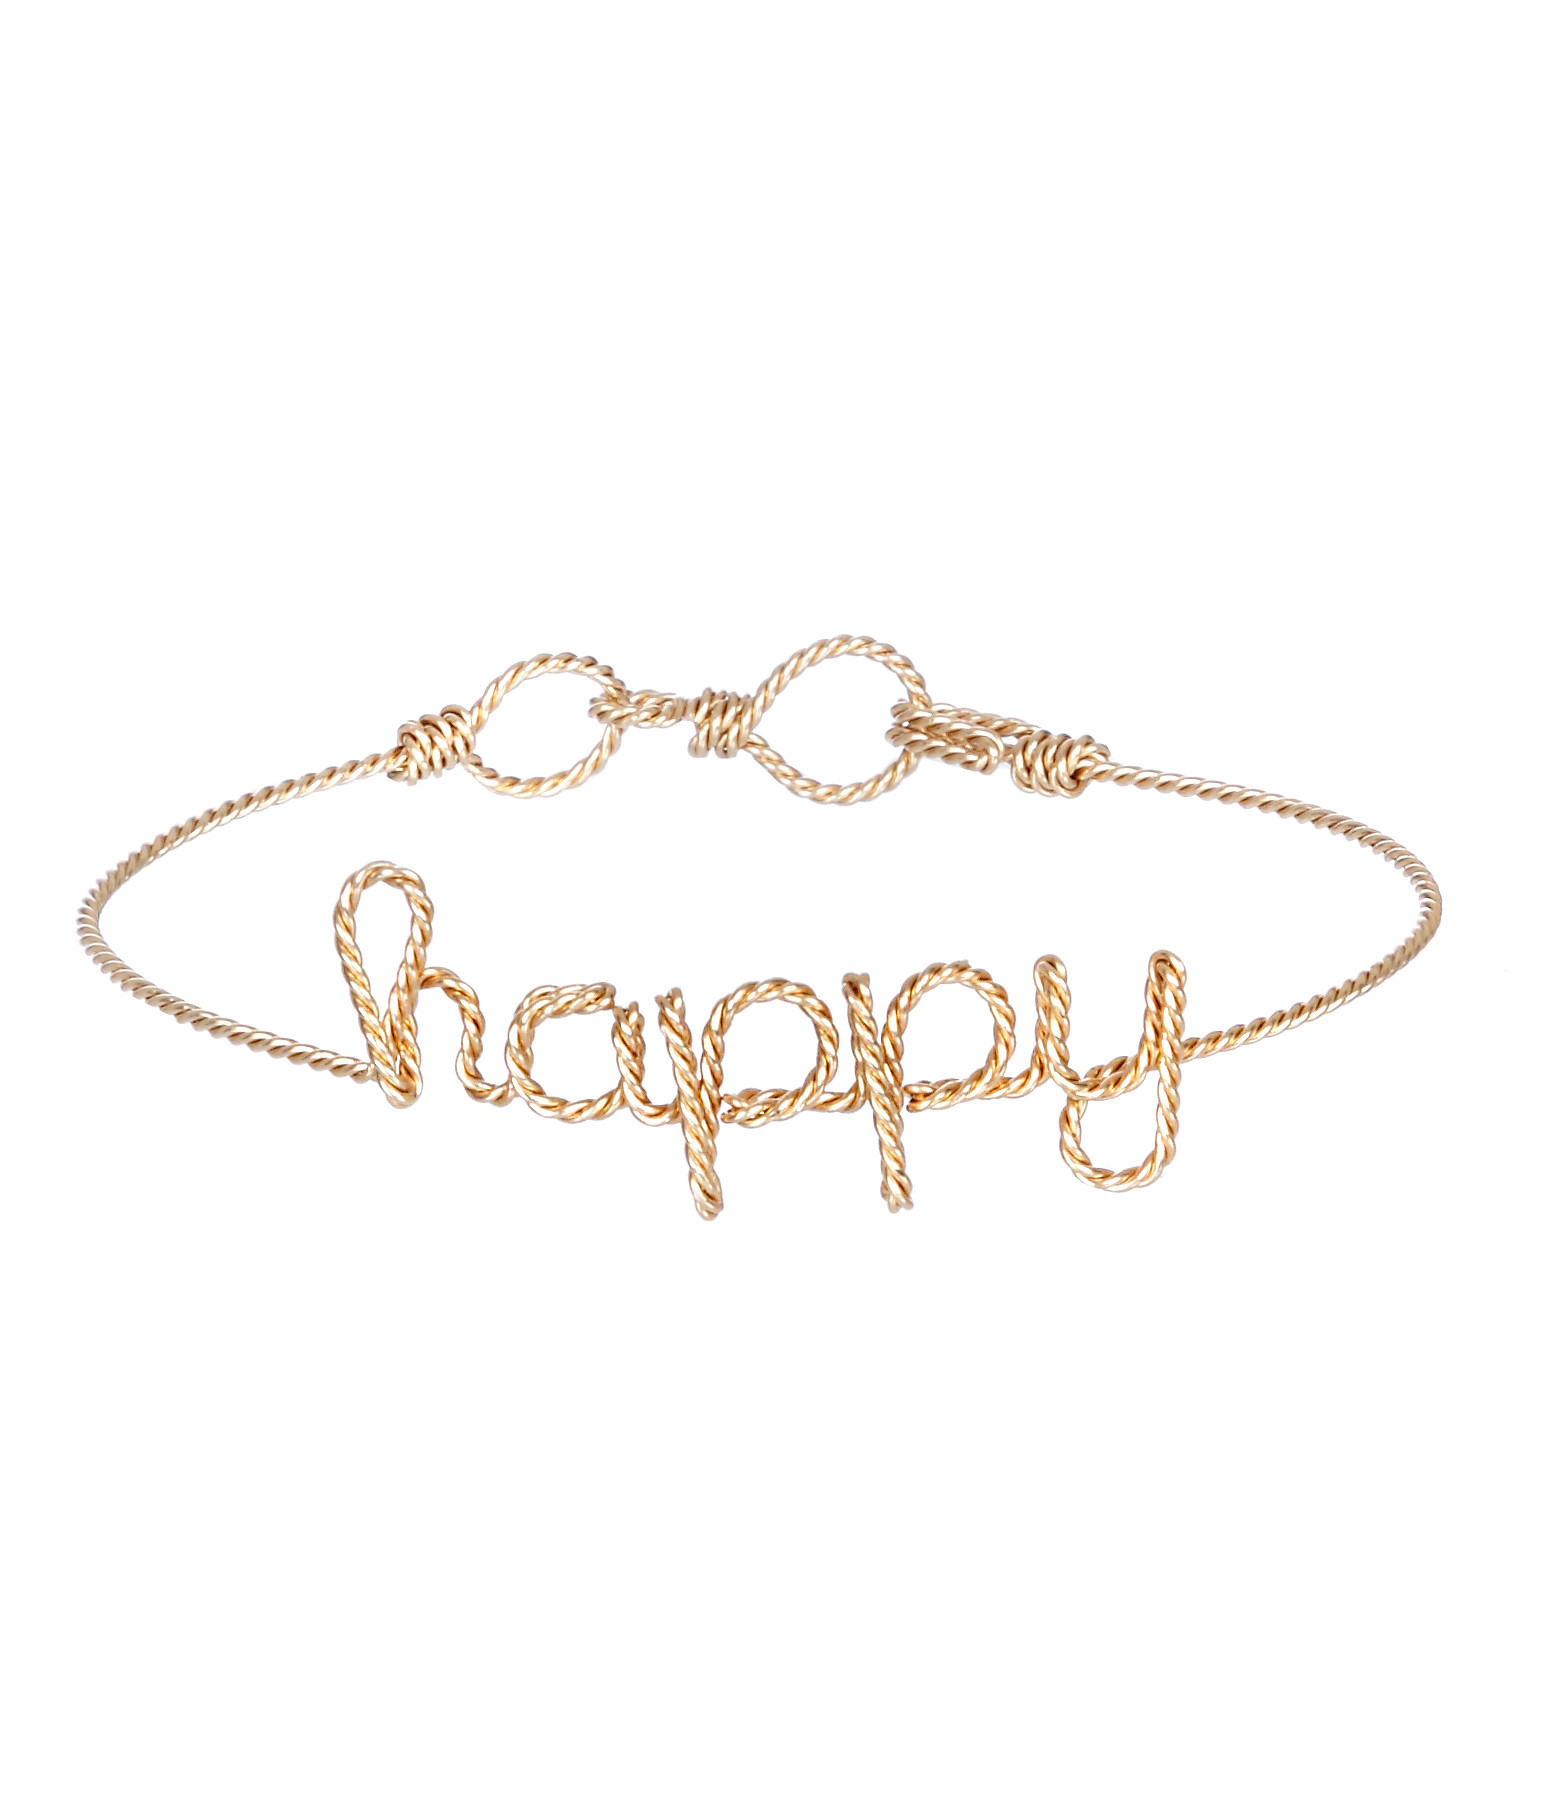 Bracelet Fils Torsadés Happy Gold Filled - ATELIER PAULIN